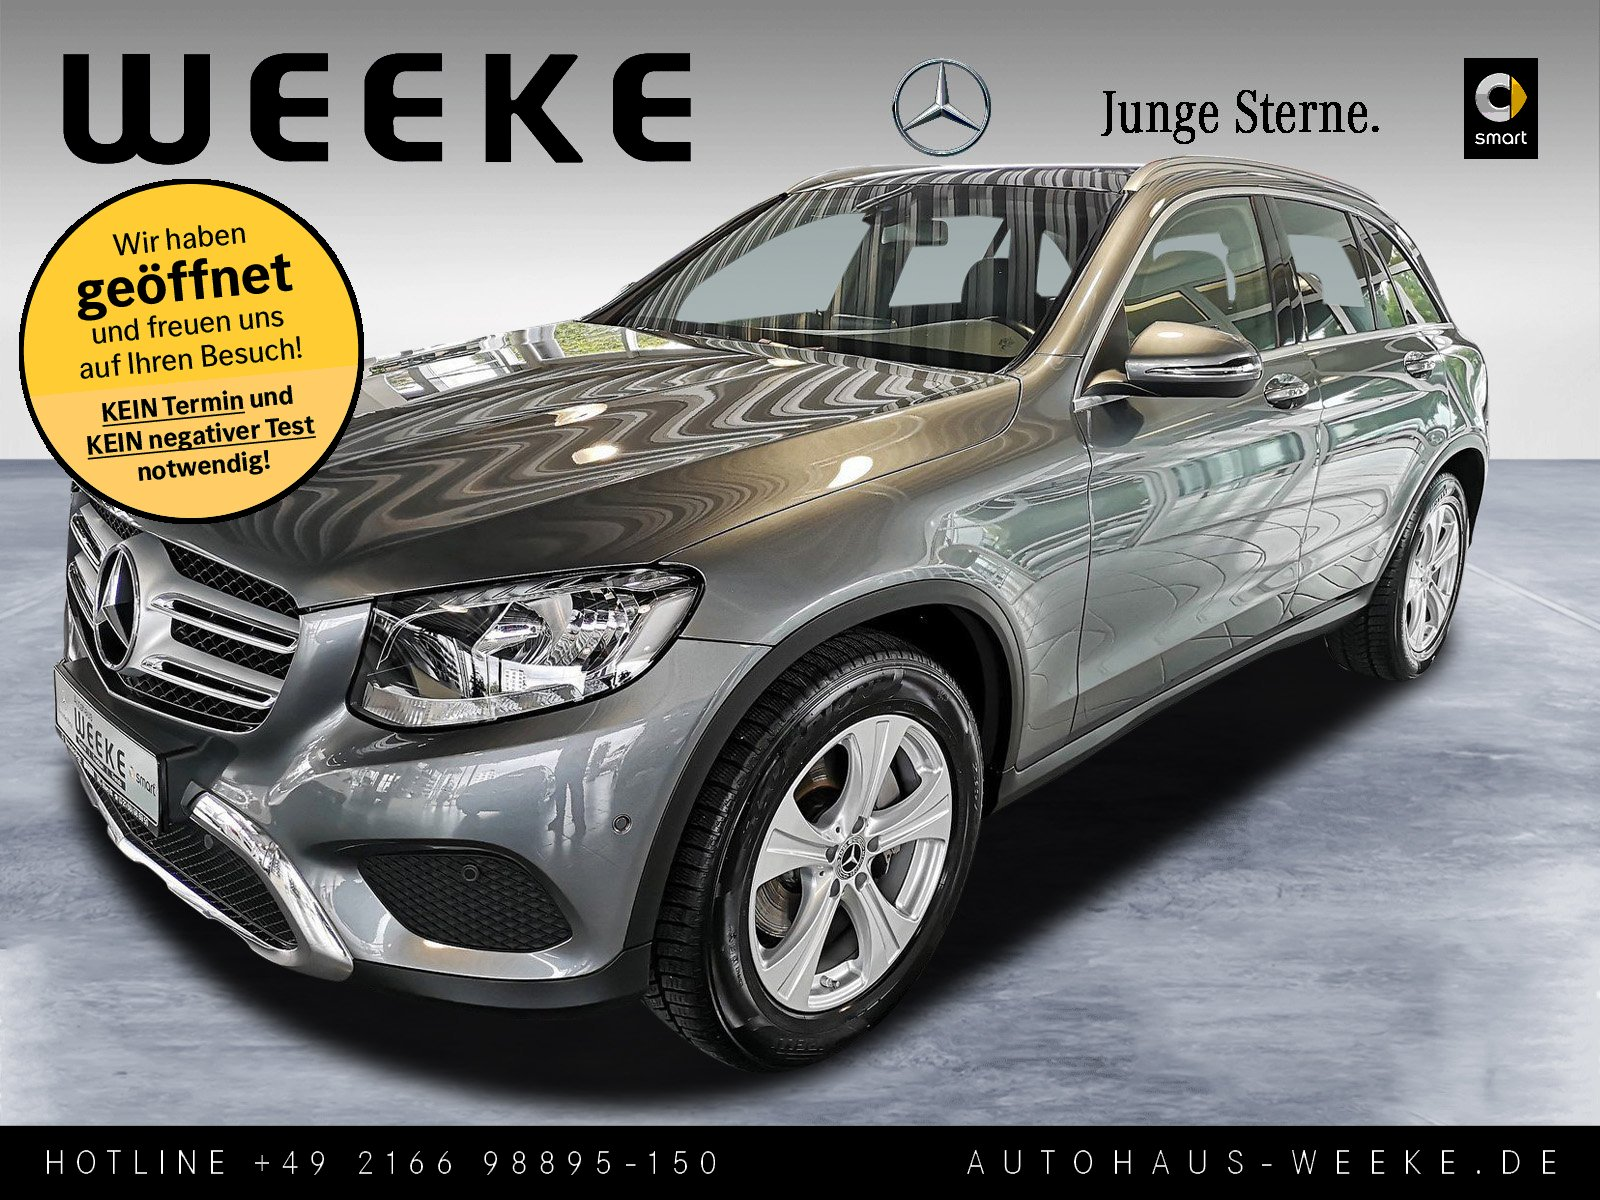 Mercedes-Benz GLC 250 d 4M EXCLUSIVE+BURMESTER+AHK+KAMERA+PANO, Jahr 2017, Diesel